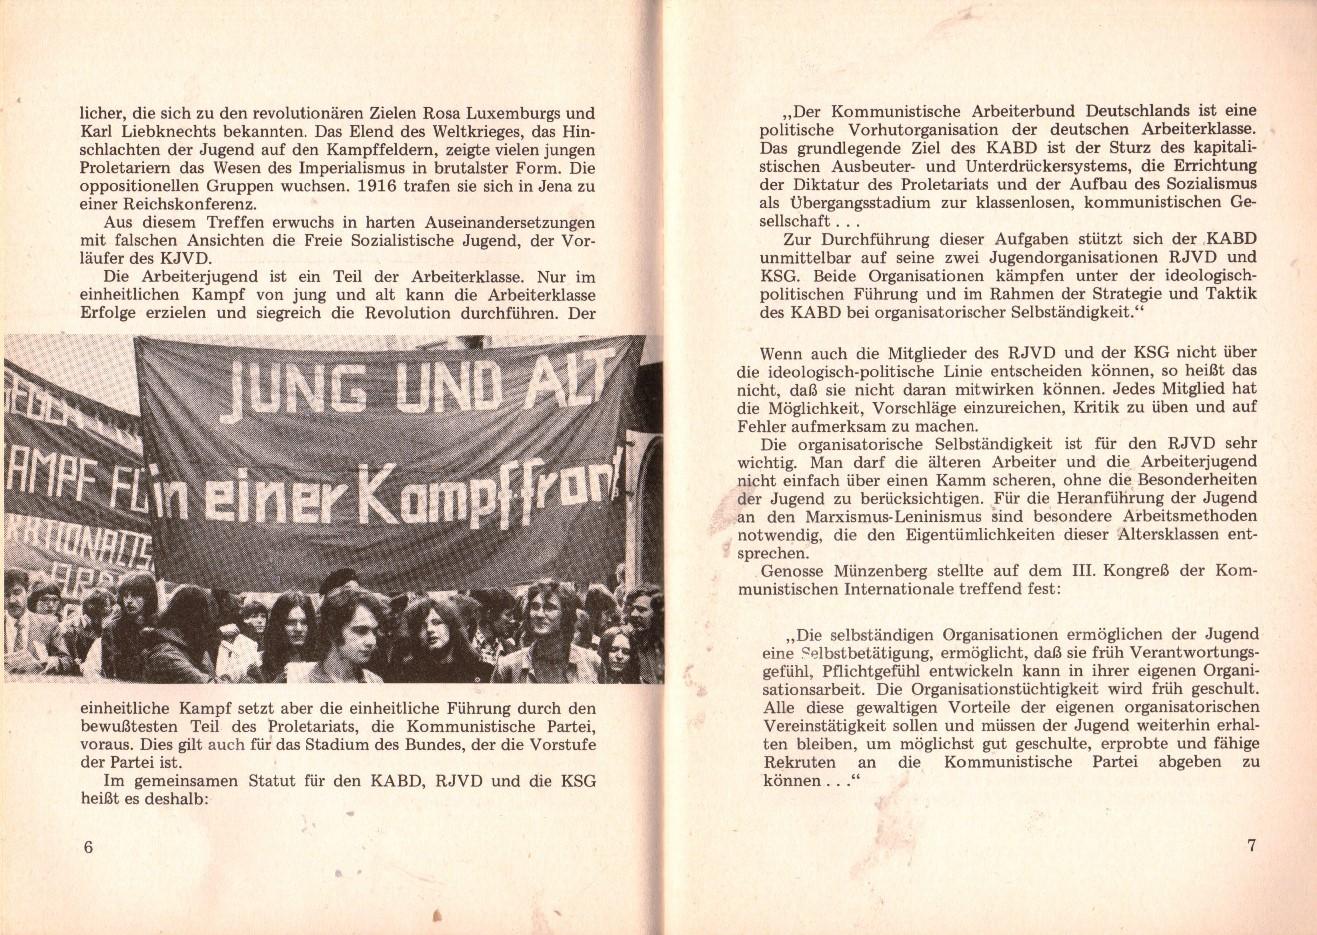 KABD_1977_Jugend_Zukunft_06